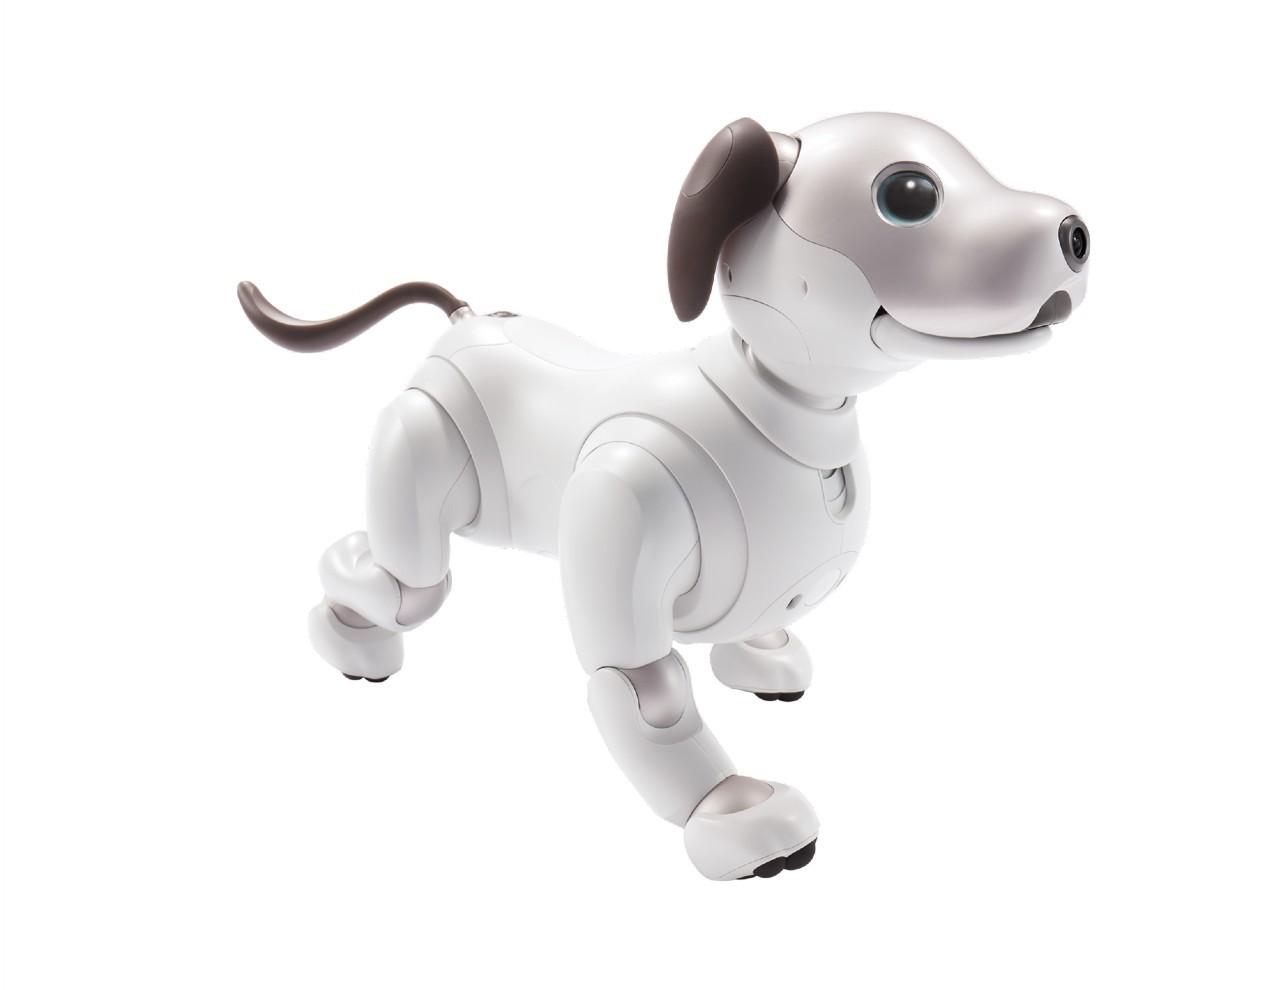 Aibo Sony robot pets